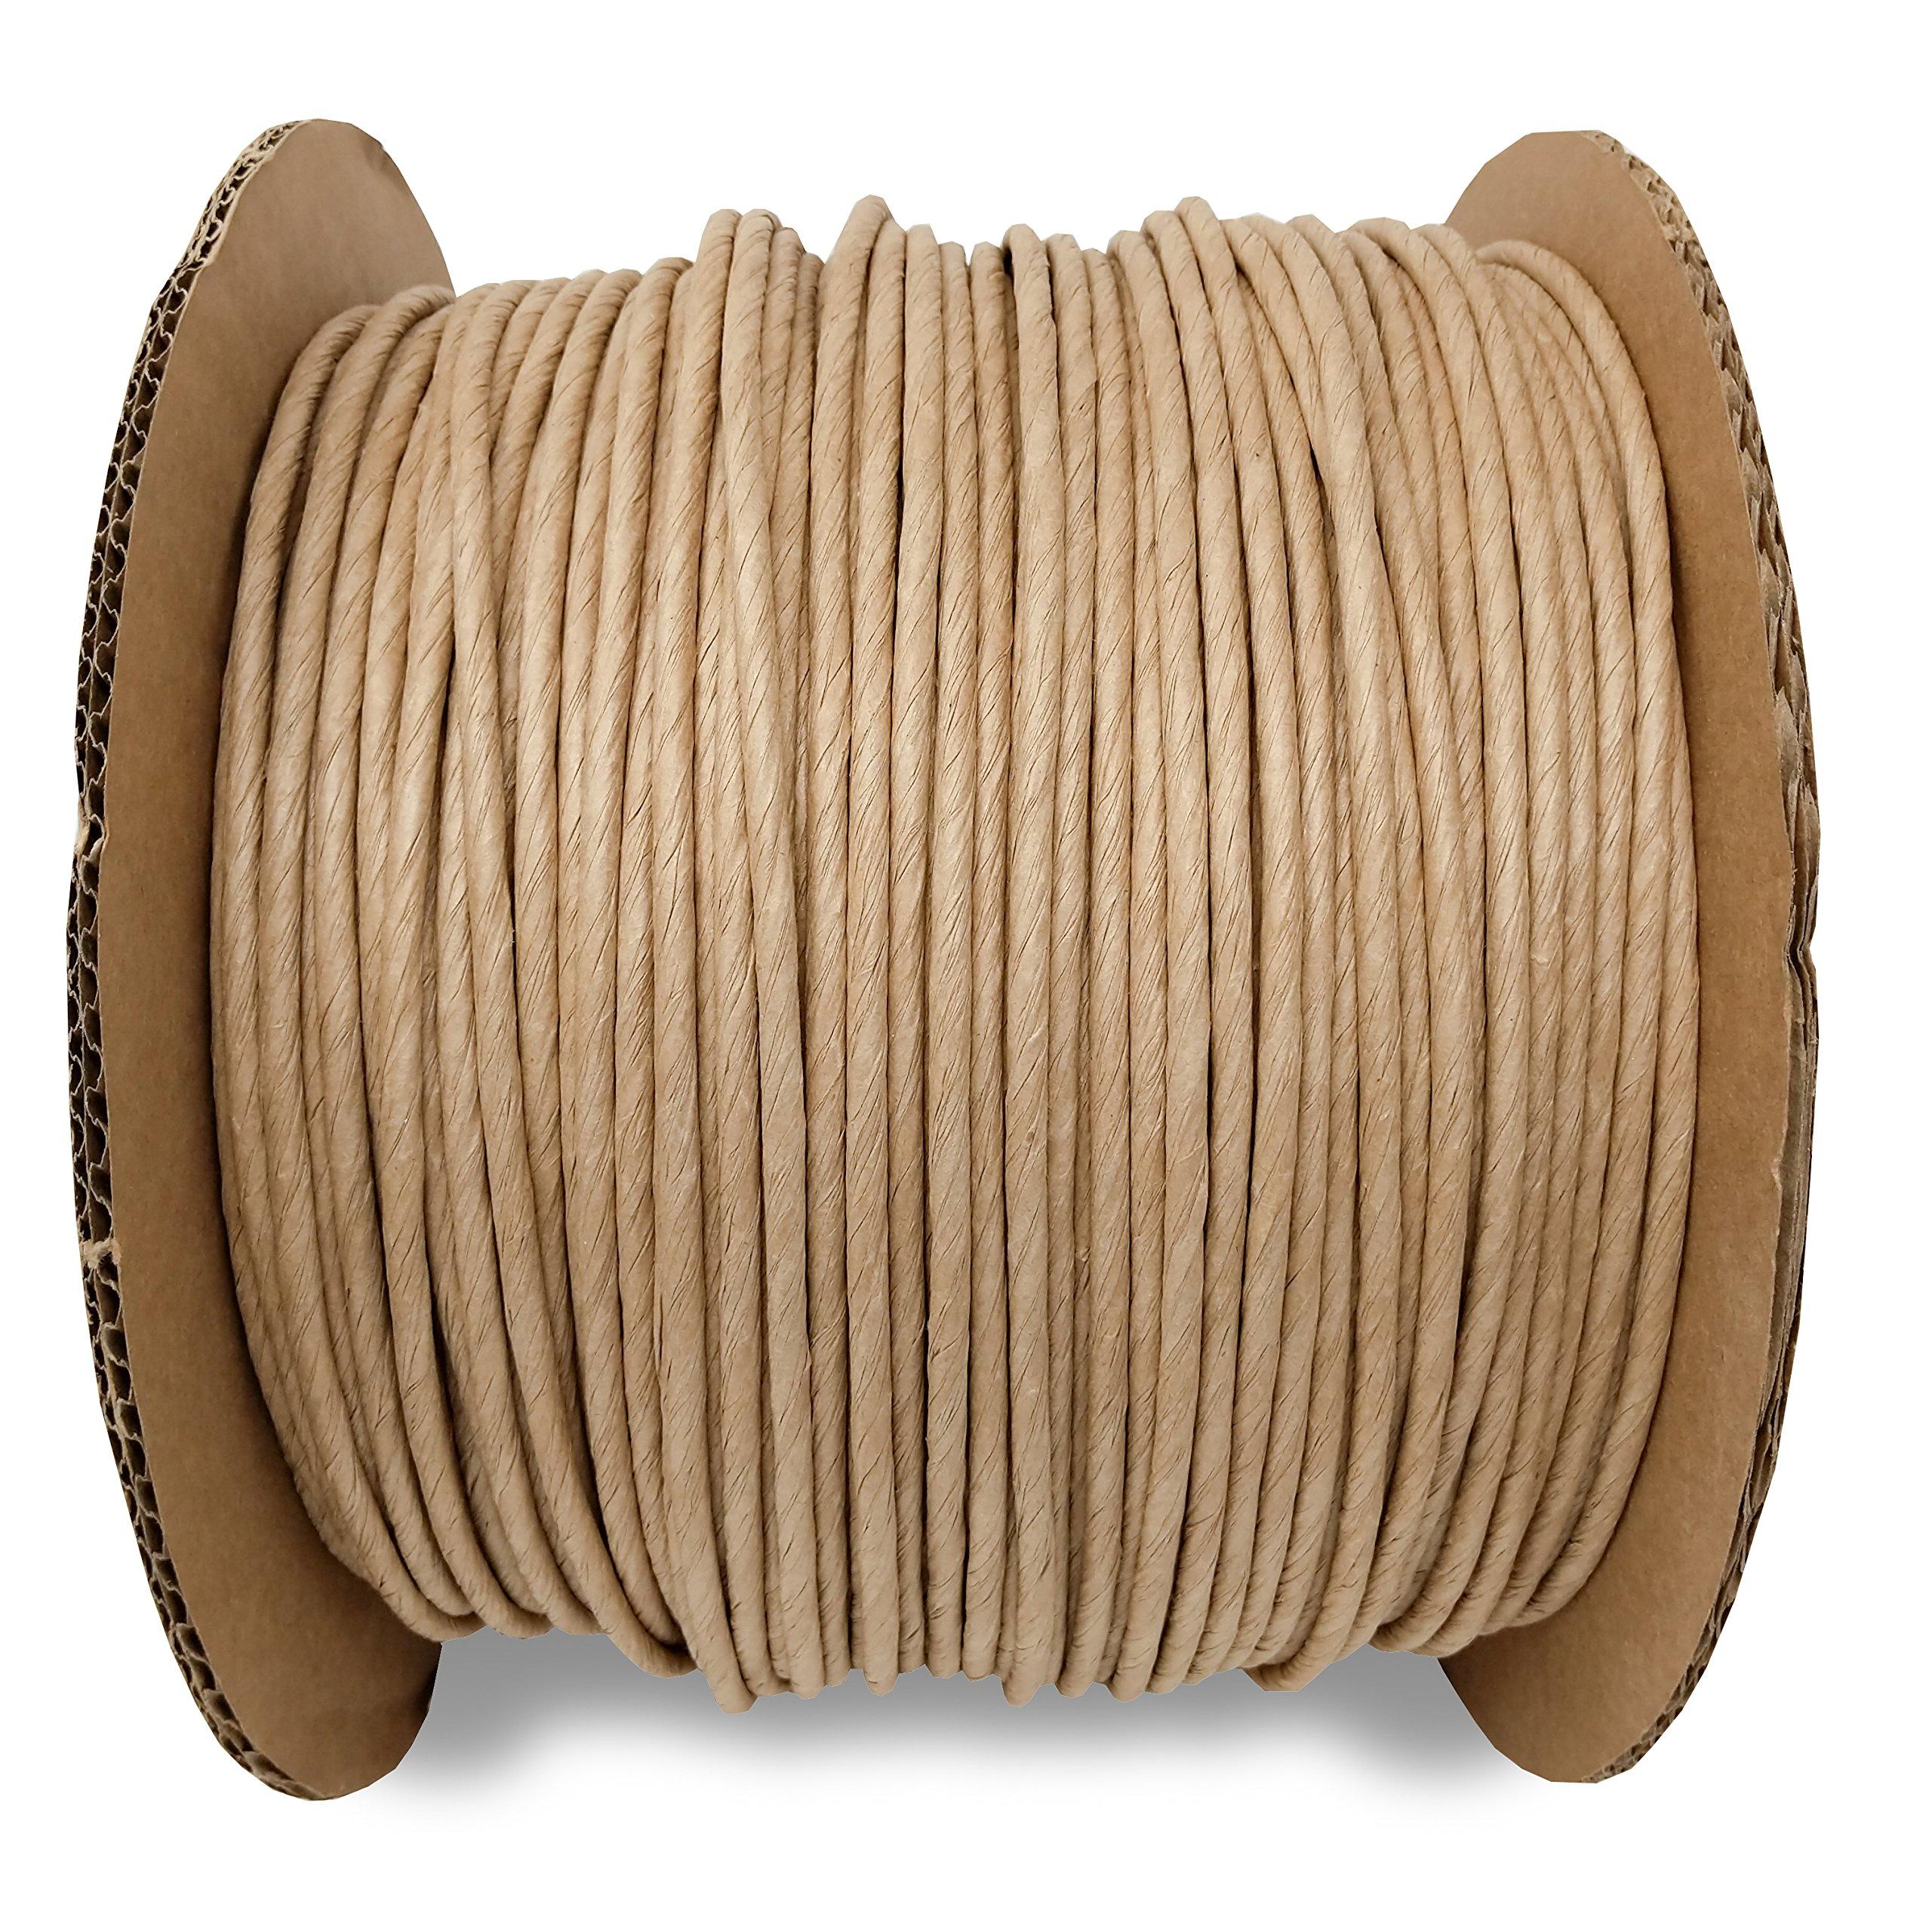 5/32 Fiber Paper Rush Spool Reel, 1,700ft Kraft Brown for Craft Weaving Chairs Ladderbacks